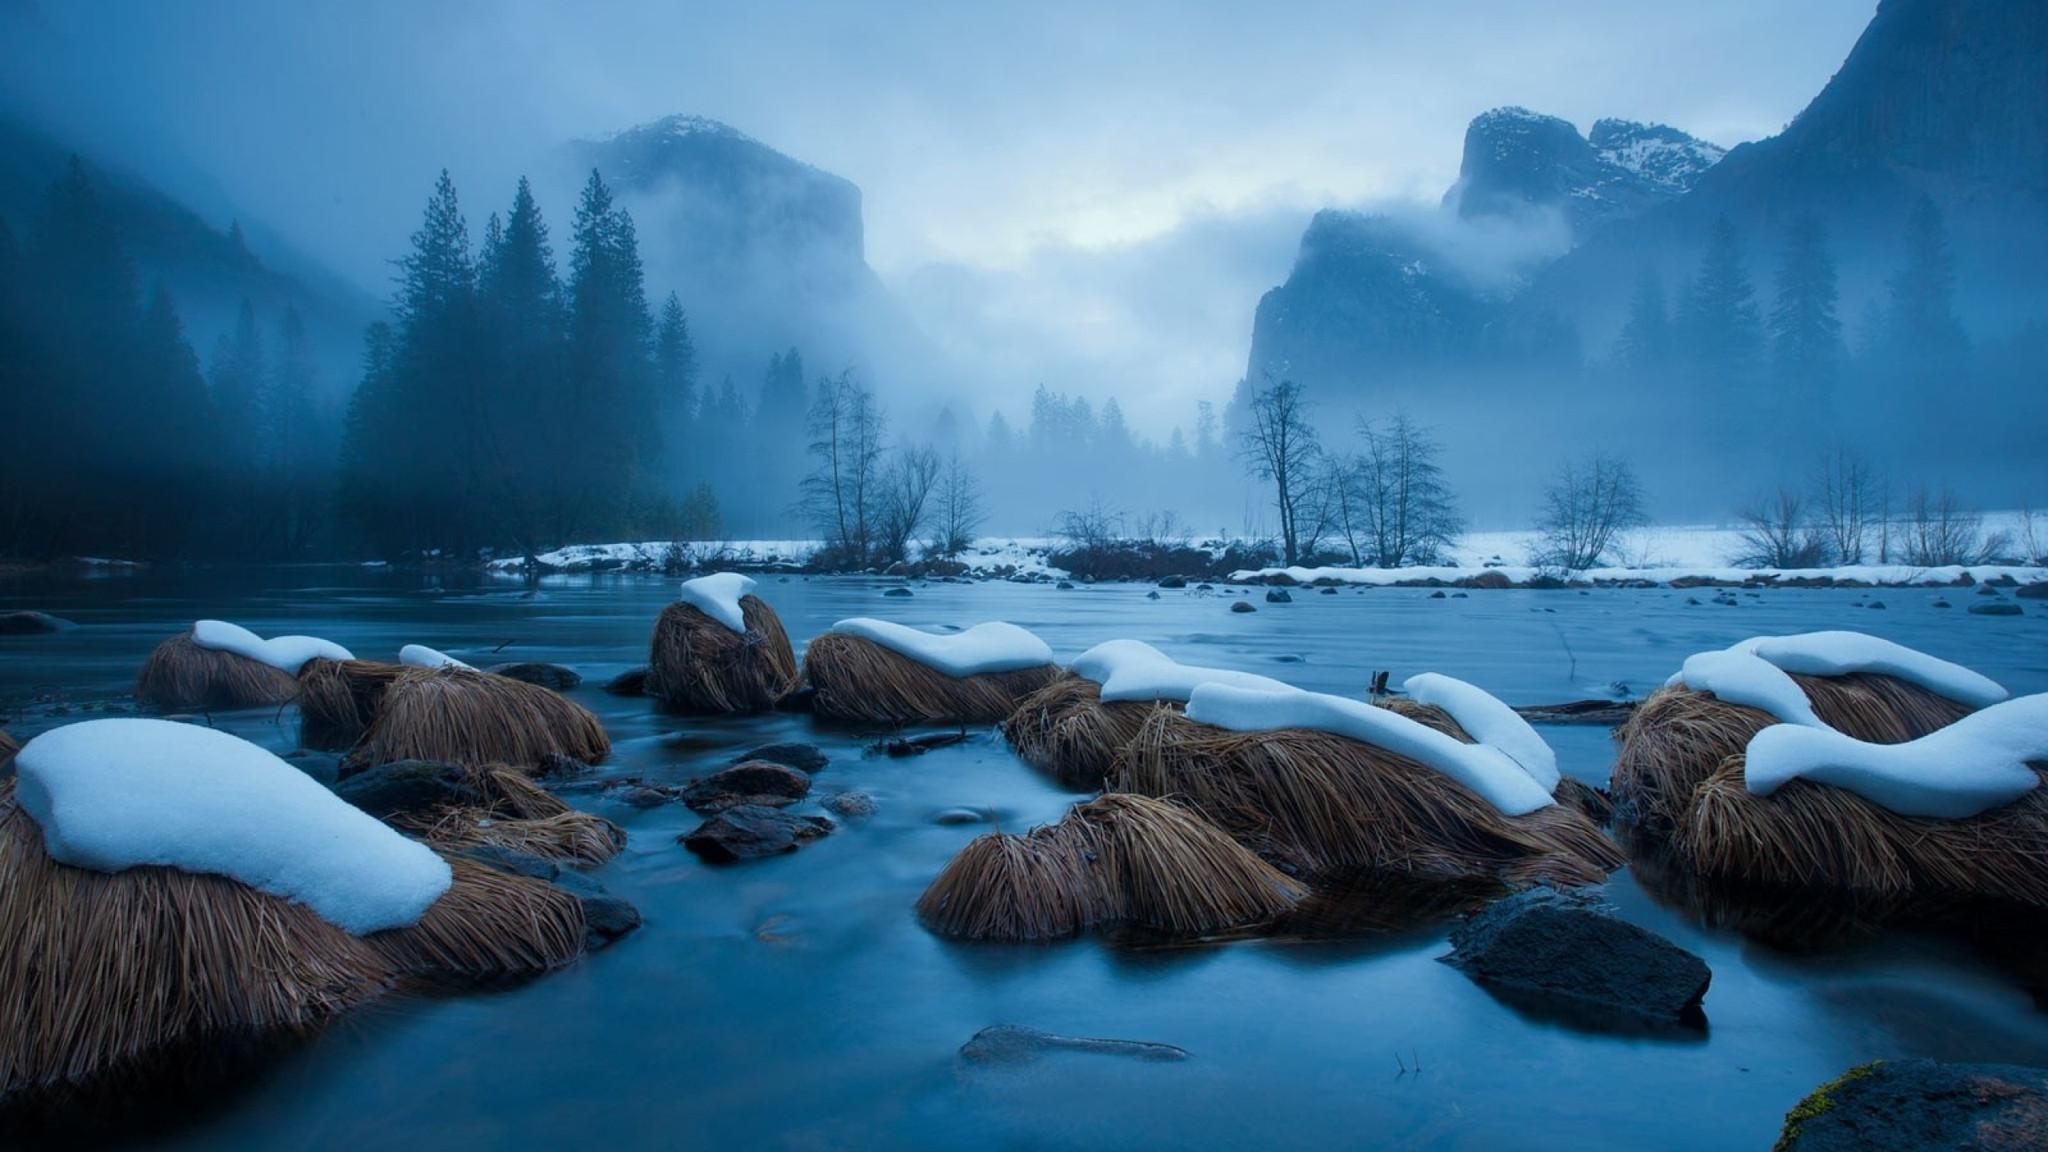 ws_Yosemite_National_Park_Winter_2560x14